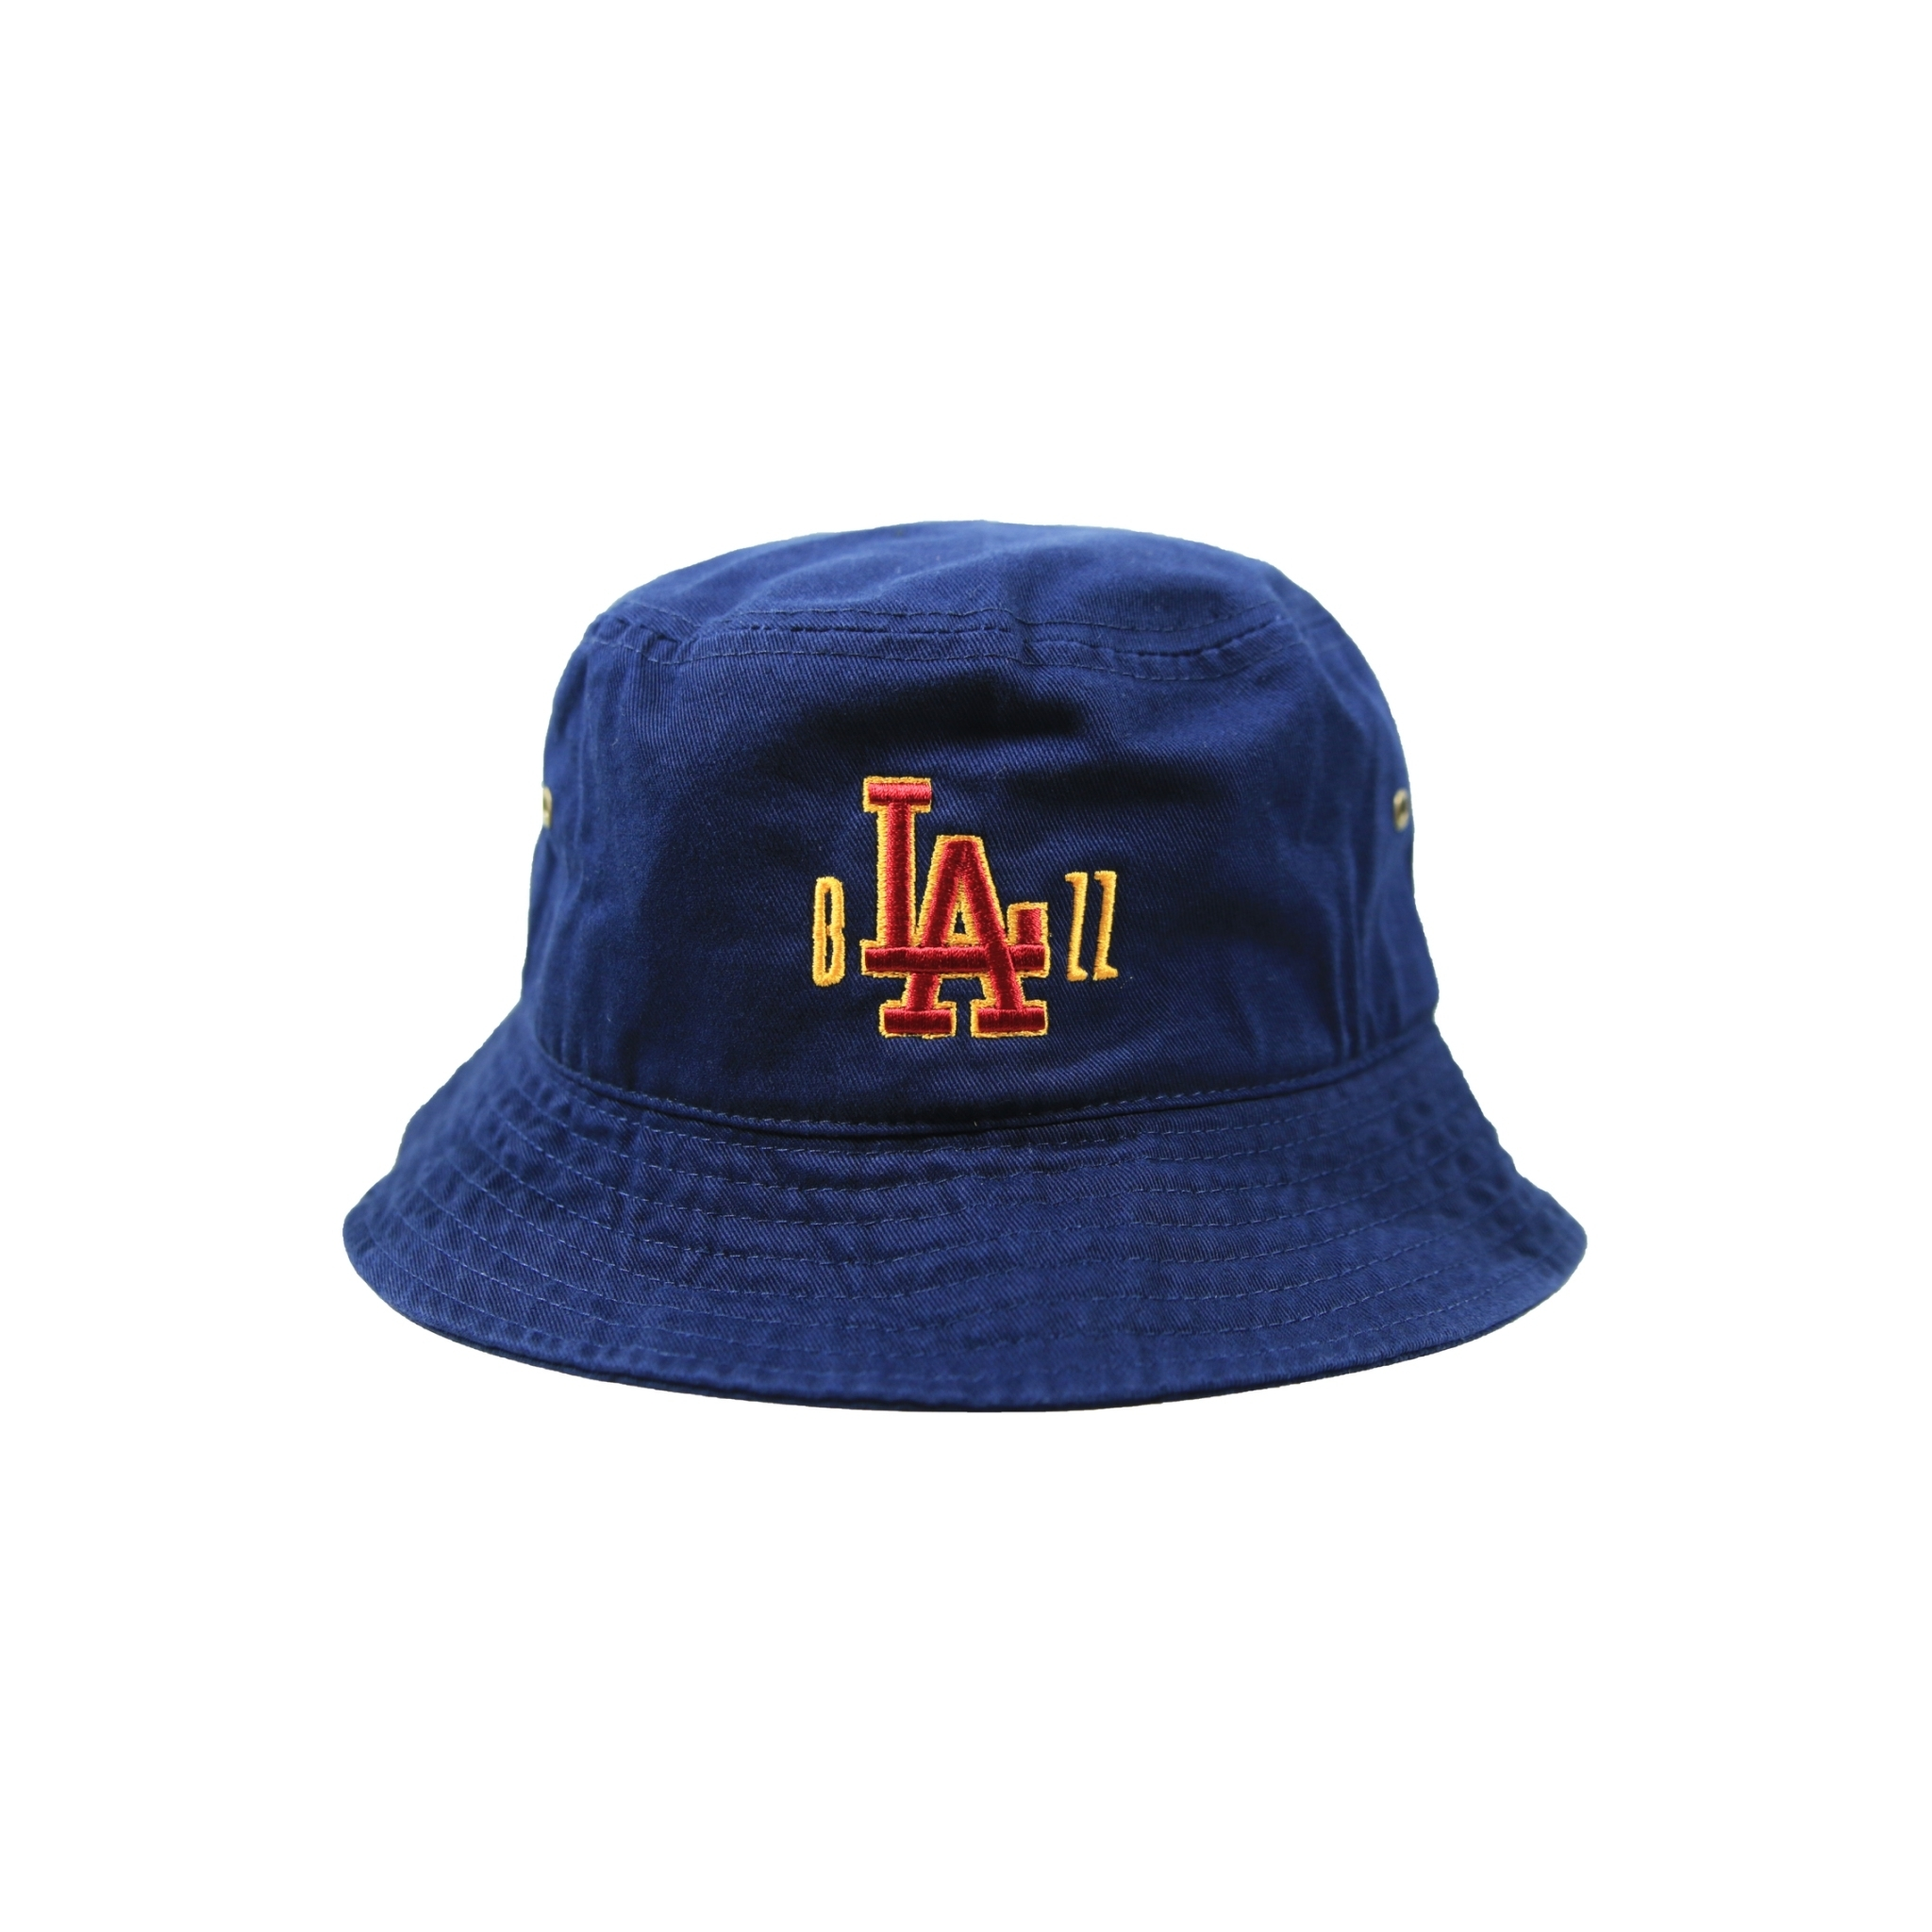 b'LA'ZZ BUCKET HAT [NAVY]